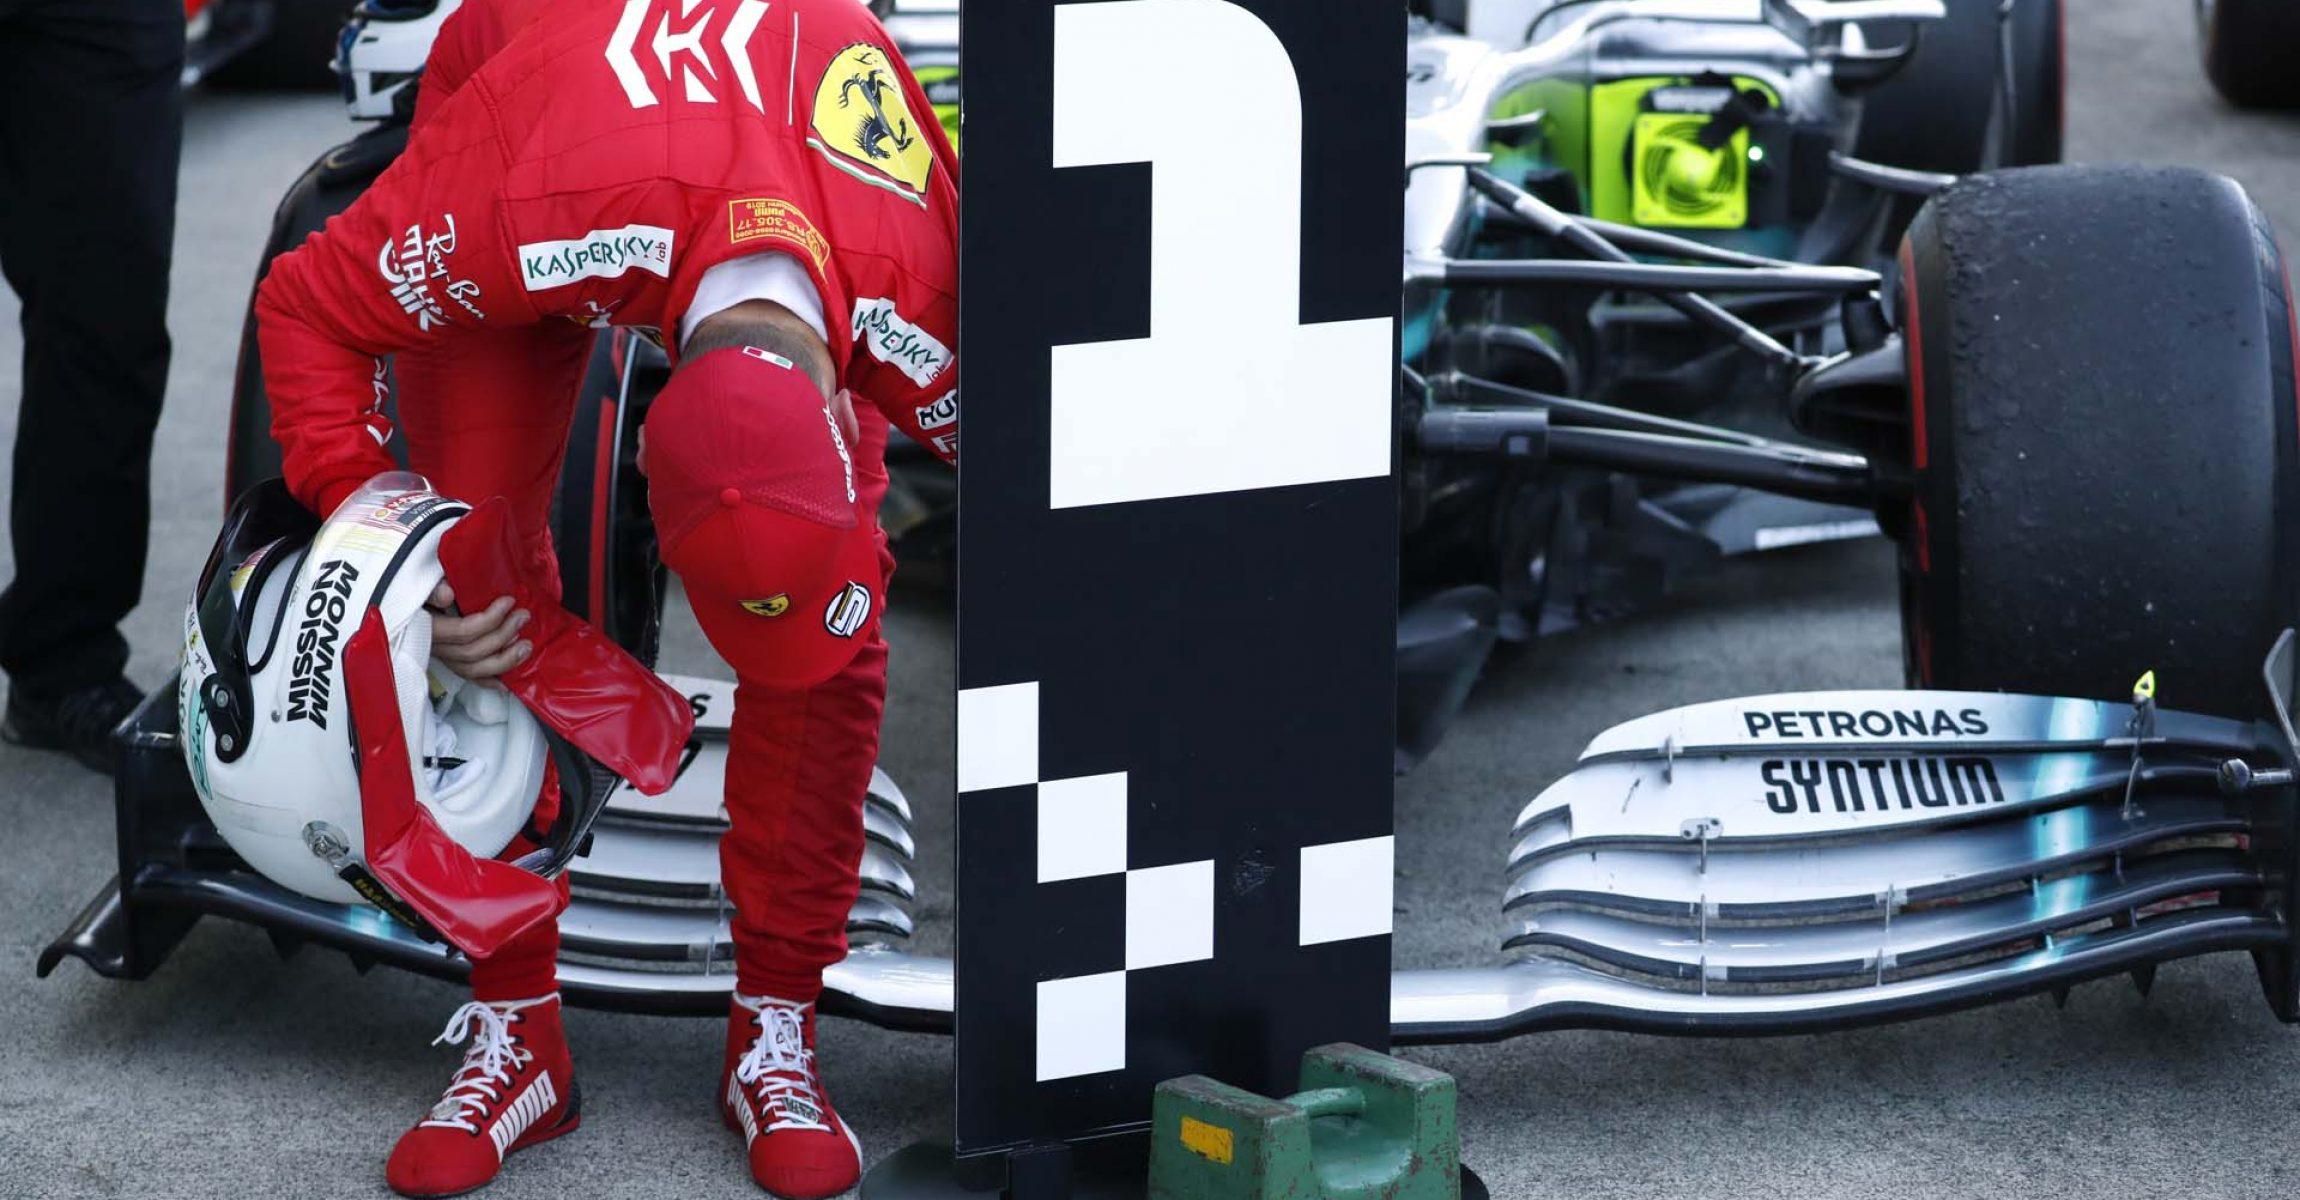 Formula One F1 - Japanese Grand Prix - Suzuka Circuit, Suzuka, Japan - October 13, 2019. Ferrari's Sebastian Vettel after the race. REUTERS/Issei Kato